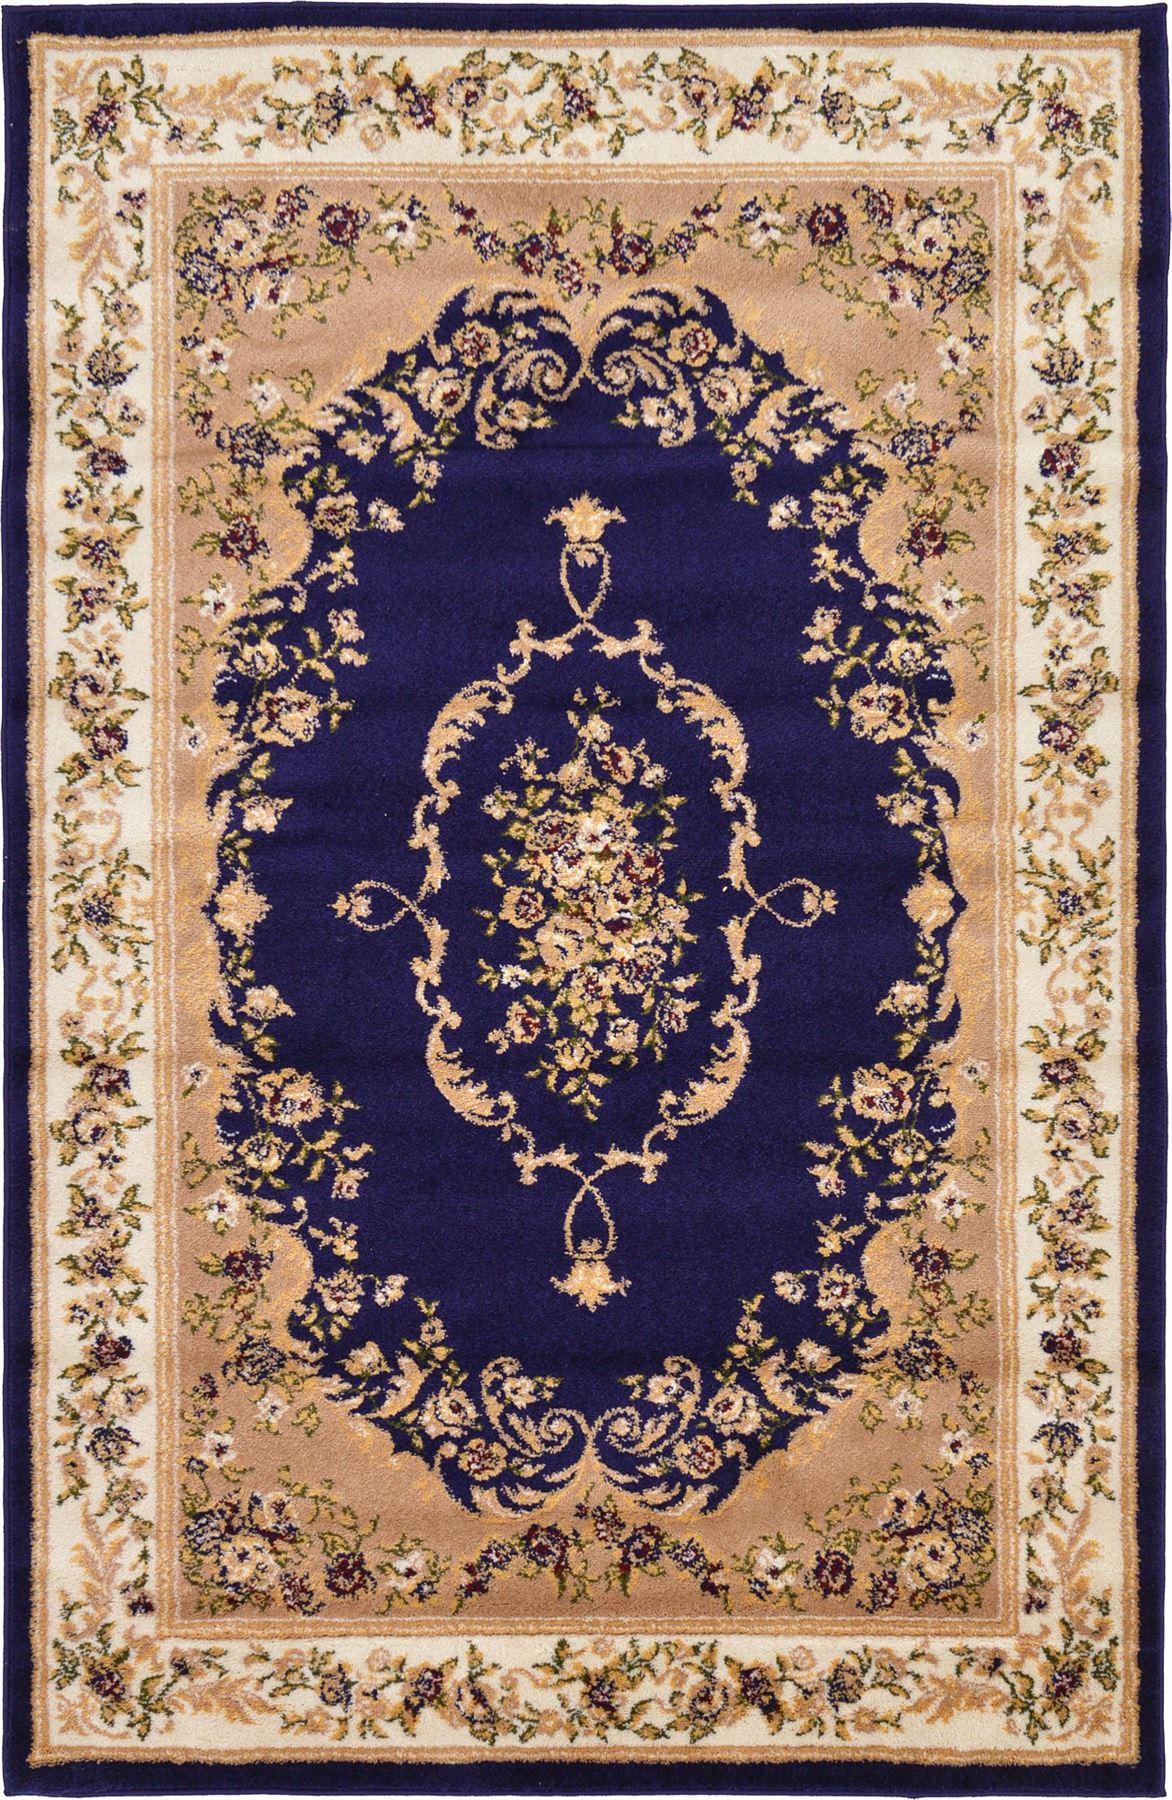 Oriental Rugs New Persian Style Area Carpet Modern Rug New Carpet  eBay